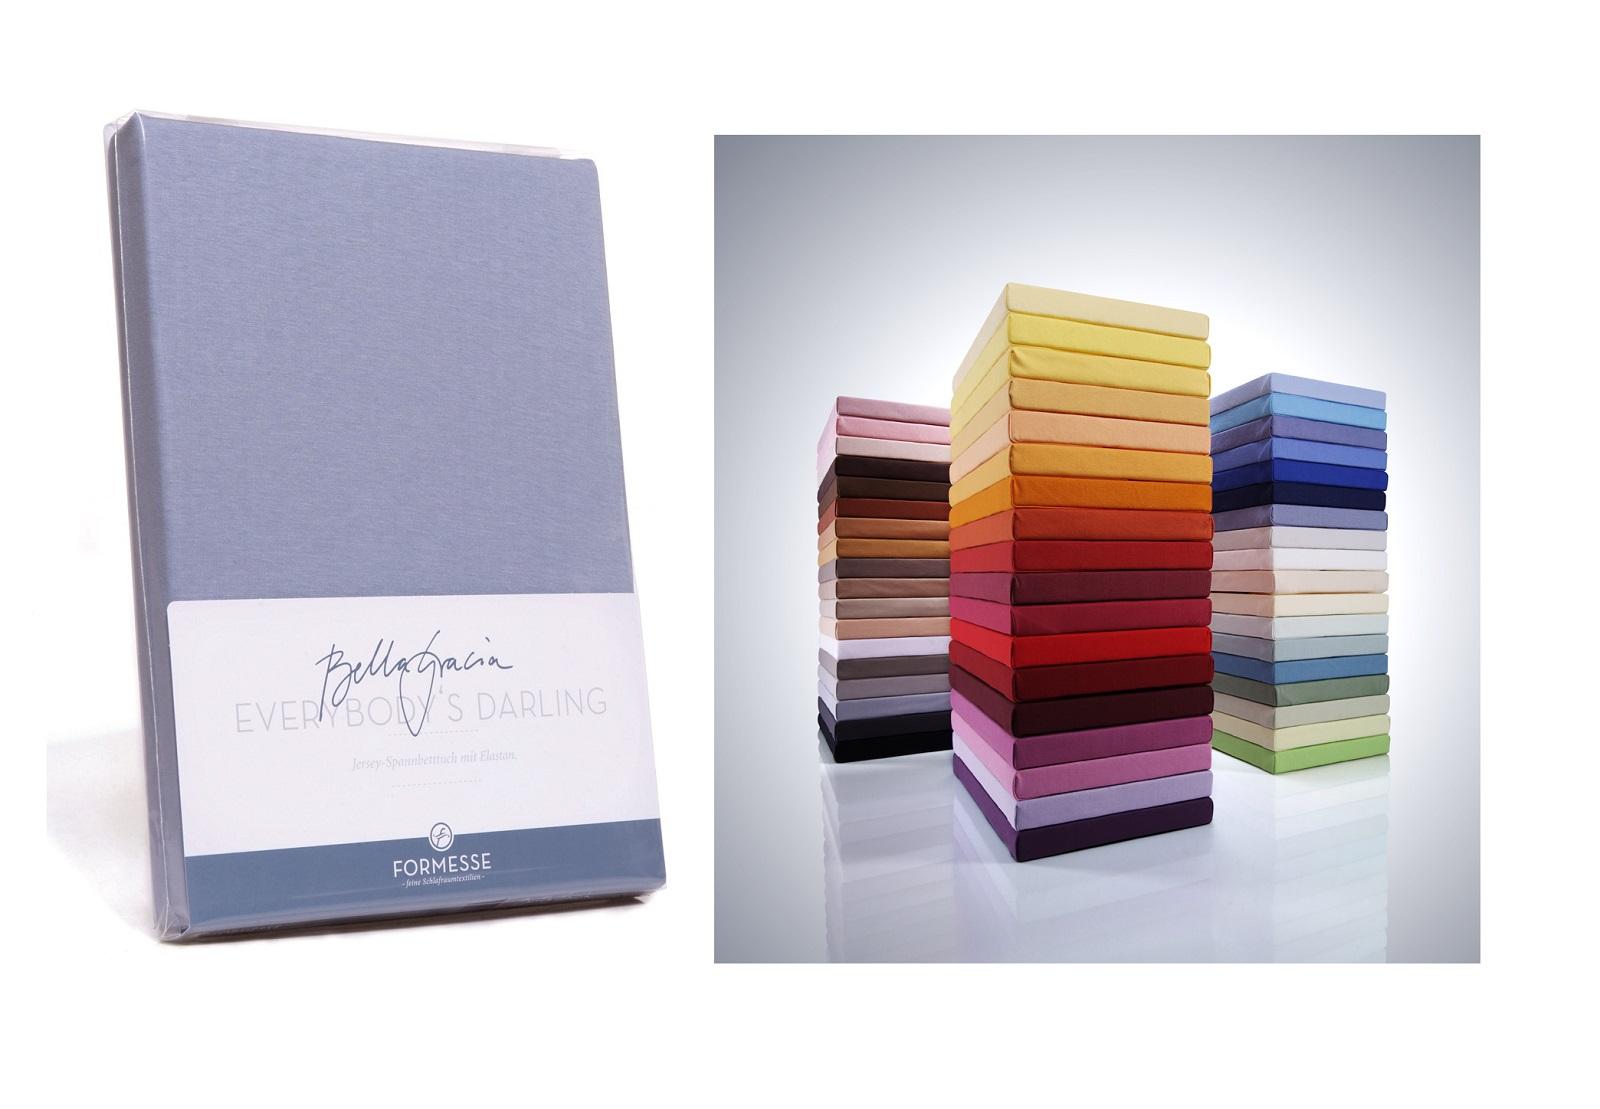 formesse bella gracia spannbetttuch luxus f r alle 180 200 x 200 220 cm ebay. Black Bedroom Furniture Sets. Home Design Ideas